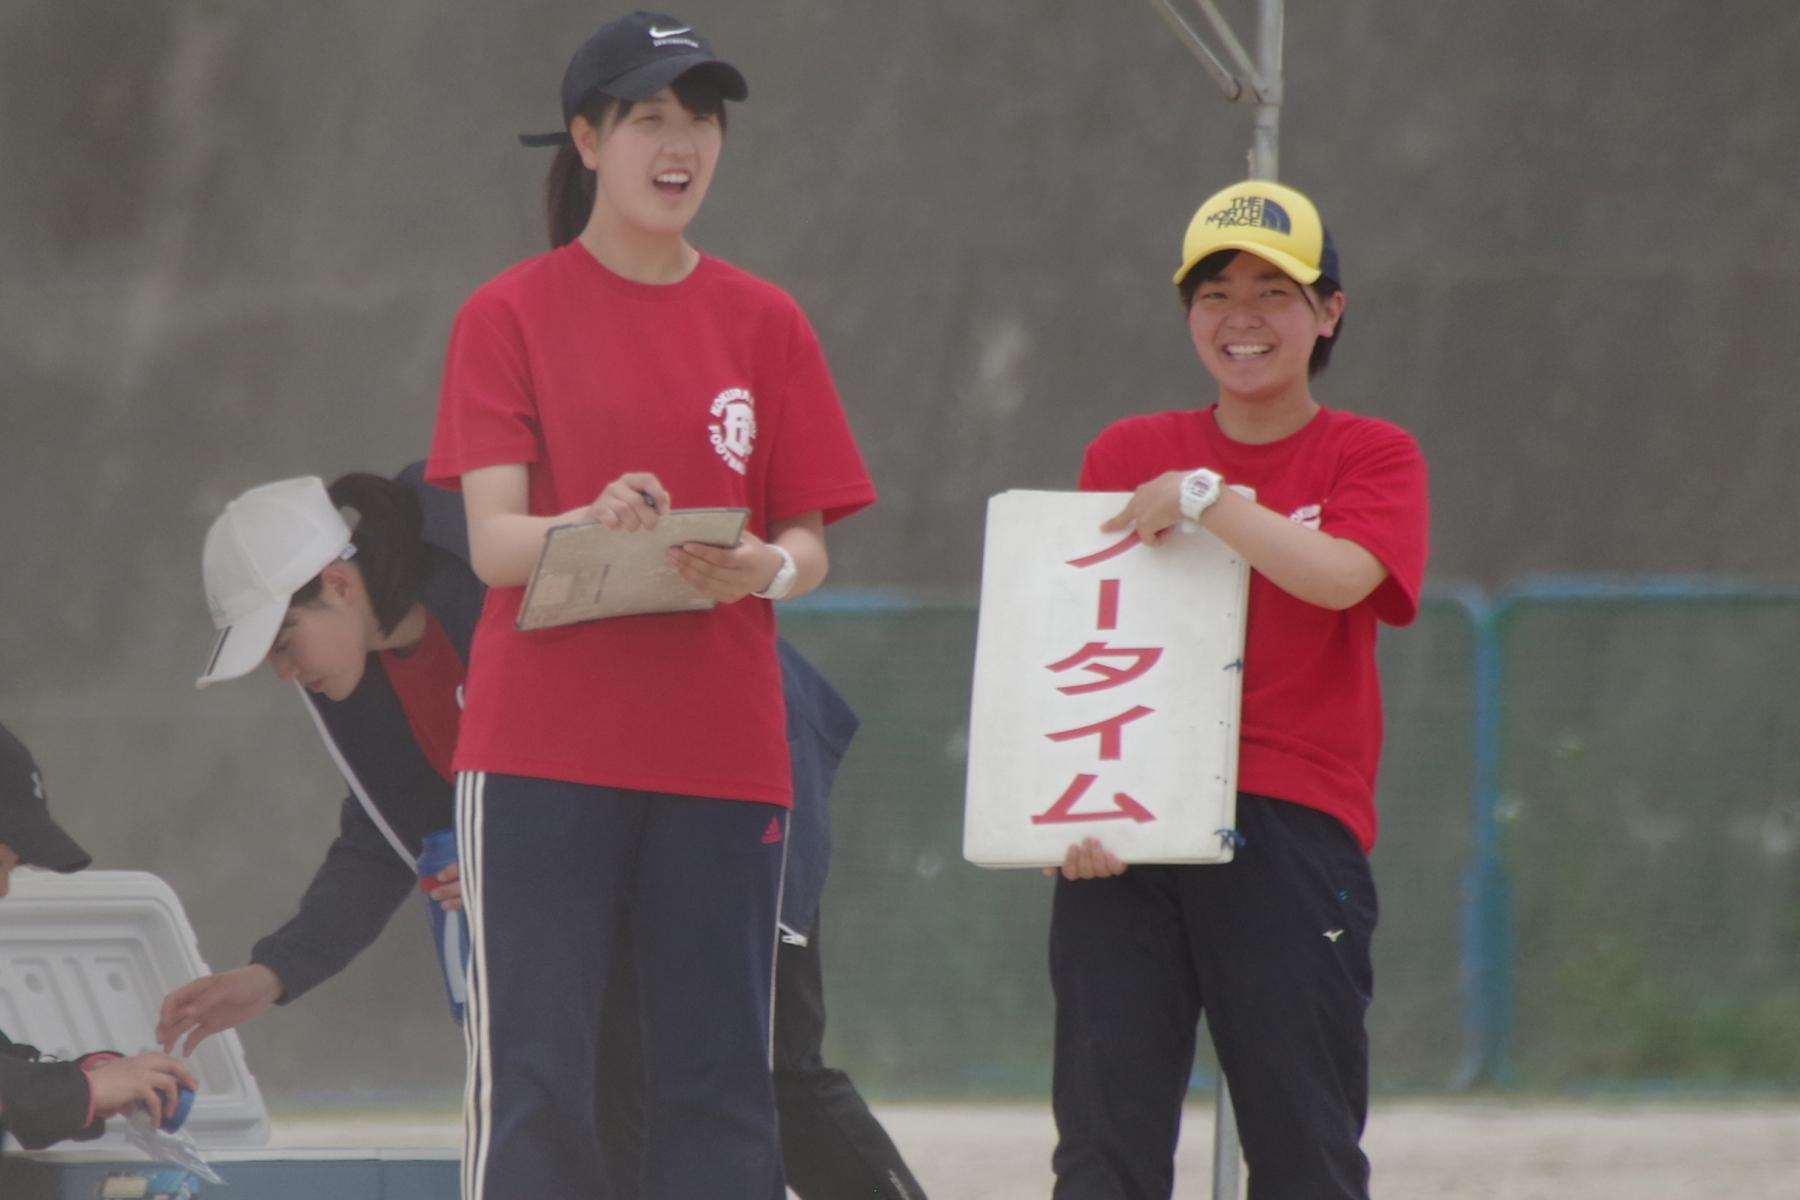 http://kokura-rugby.sakura.ne.jp/180527_132032_1283.jpg